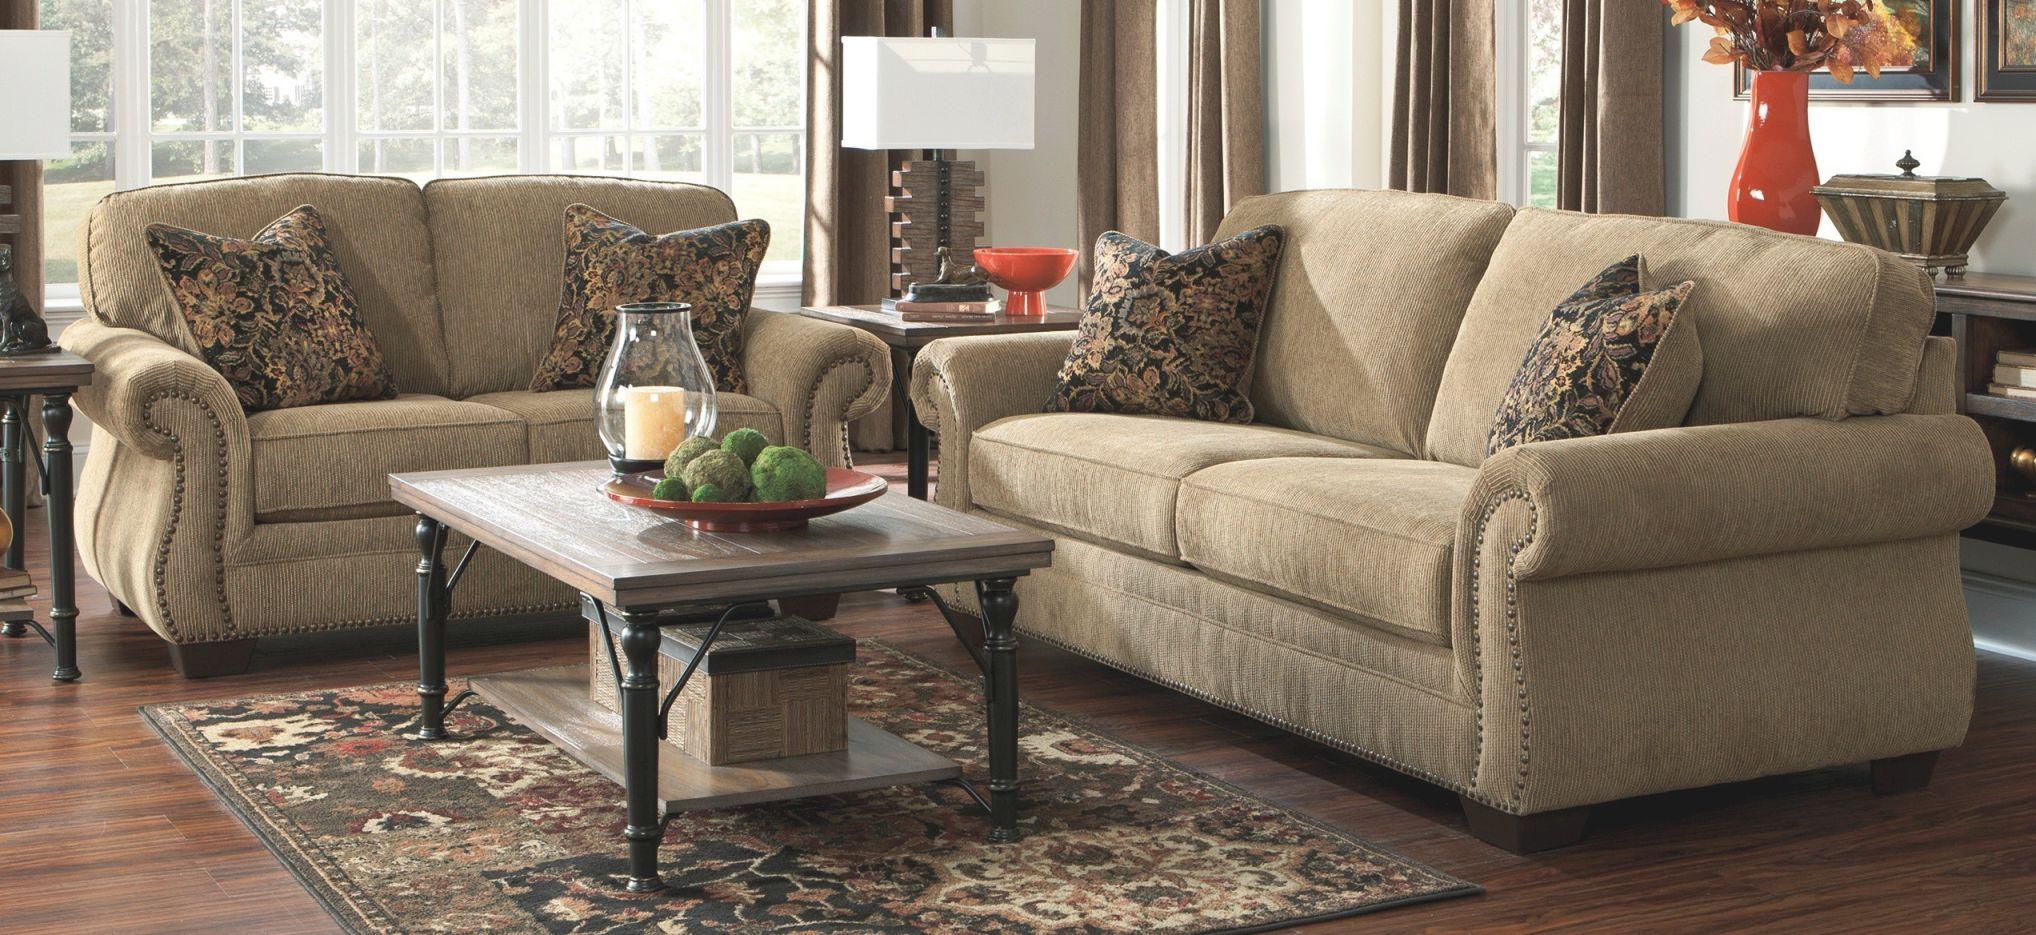 Living Room Amusing Ashley Furniture Sets Complete Table ...